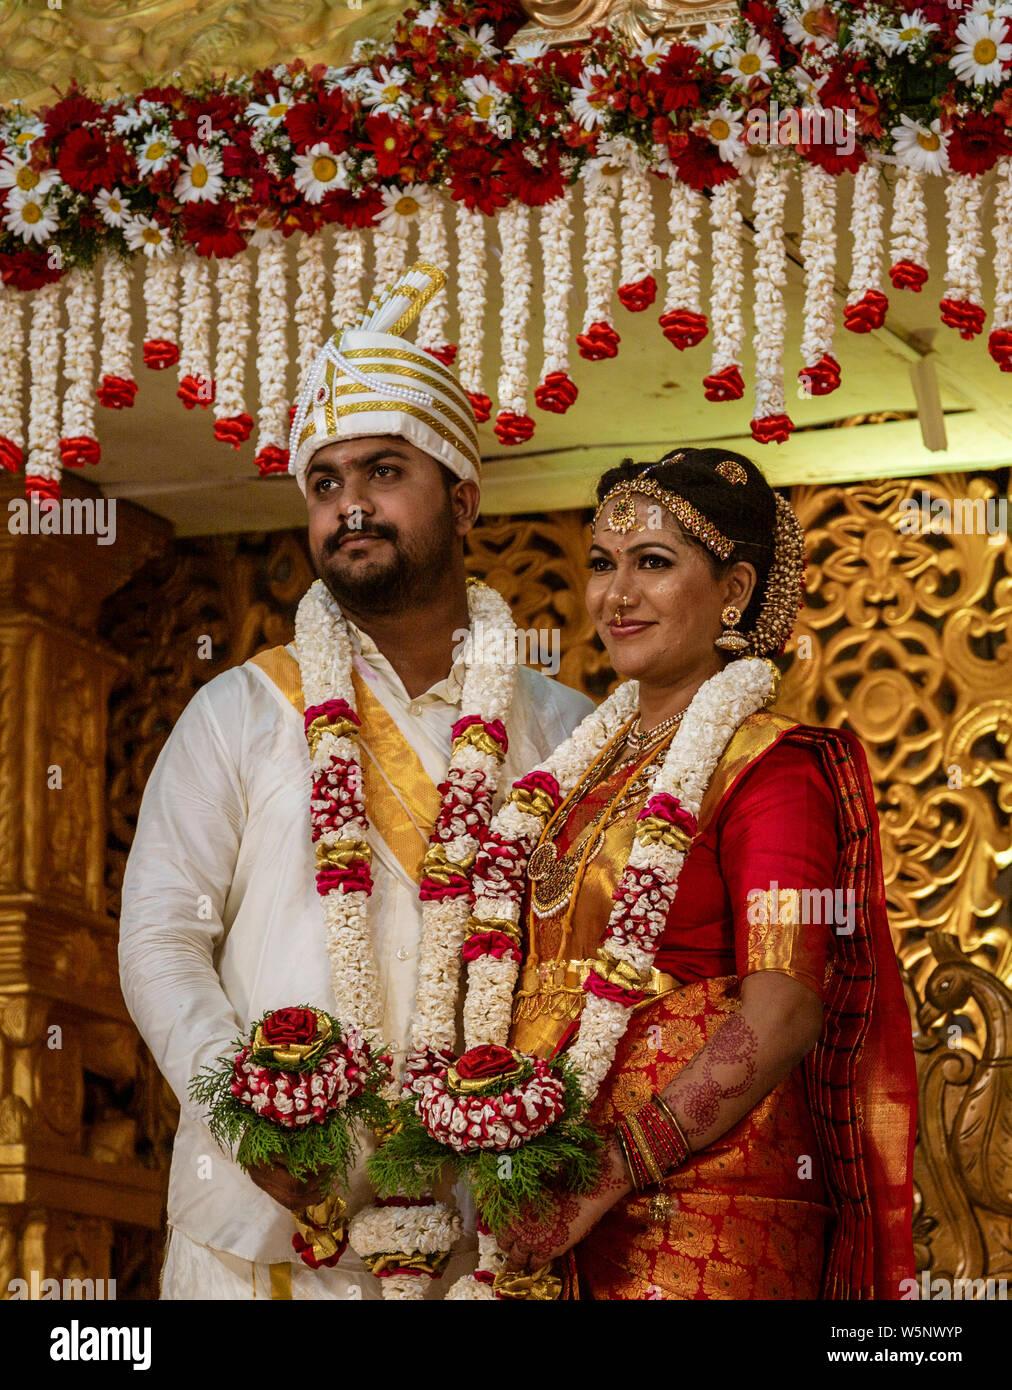 Kandy, Sri Lanka - 09-03-24 - Bride and Groom Portrait at Sri Lanka Hindu Wedding. Stock Photo